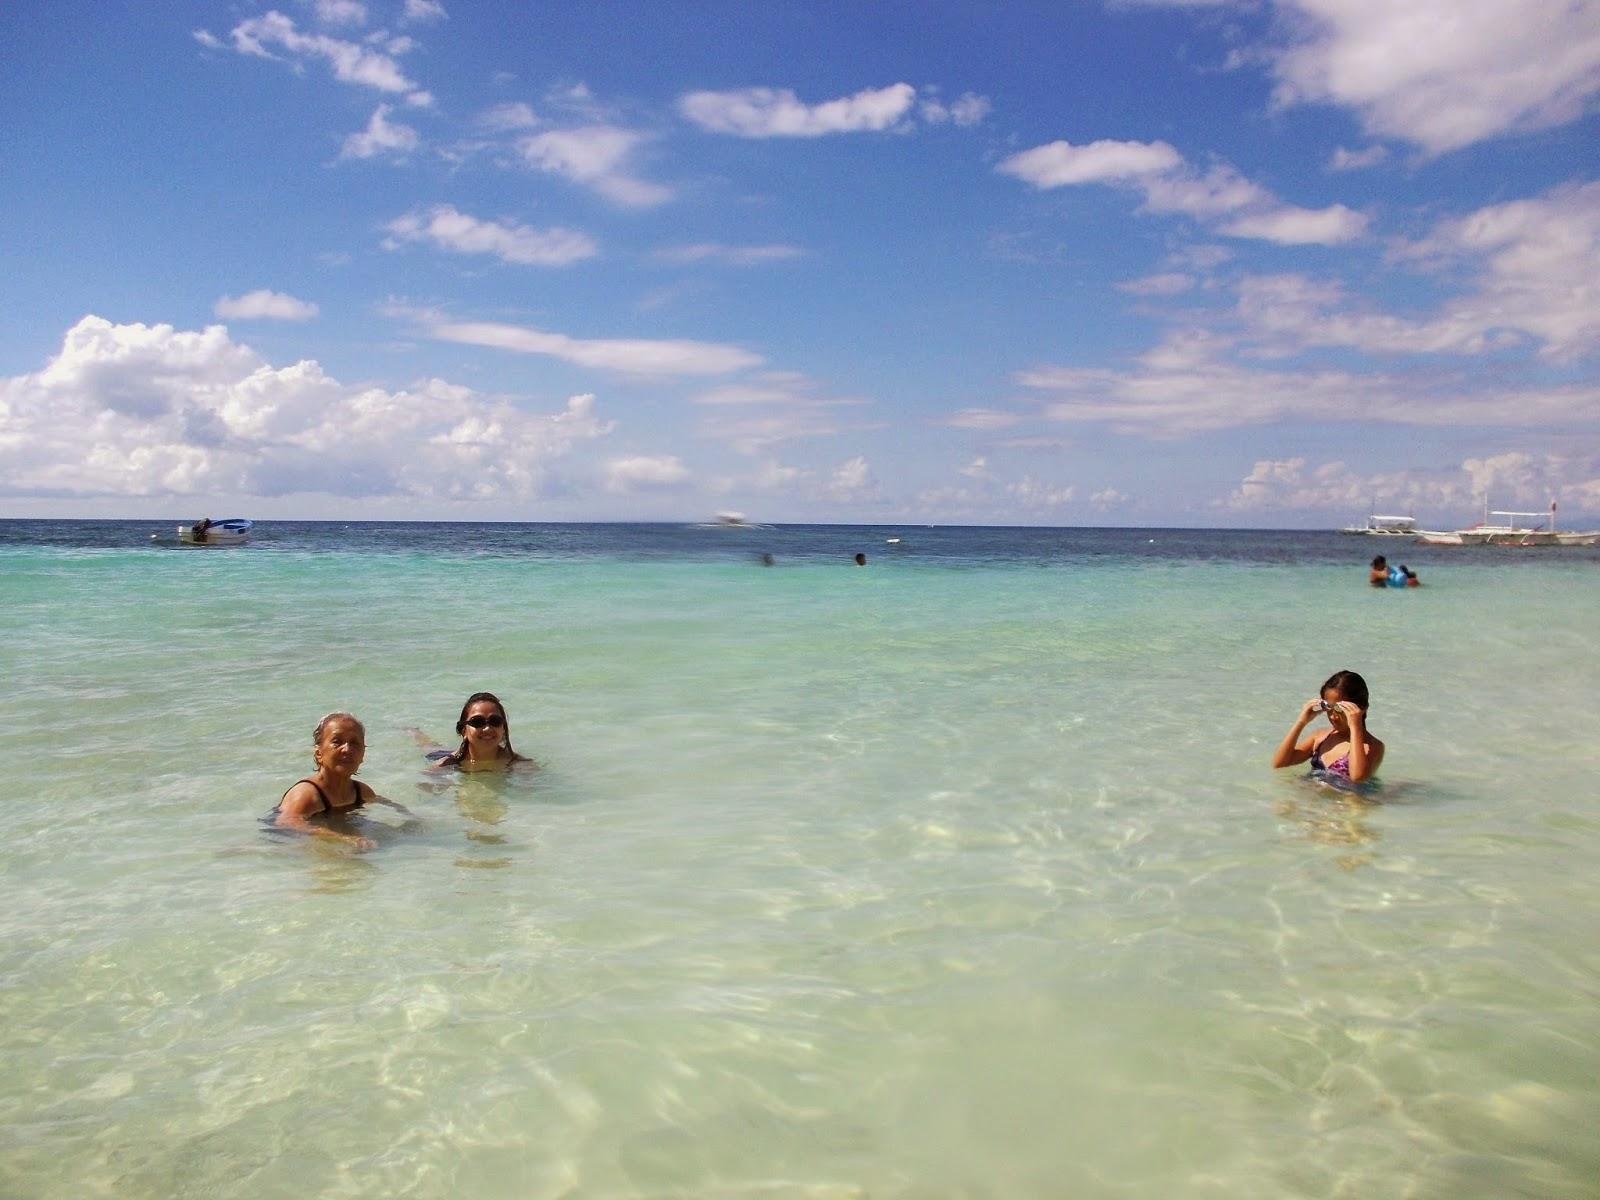 Swimming Time on Alona Beach In Panglao Bohol